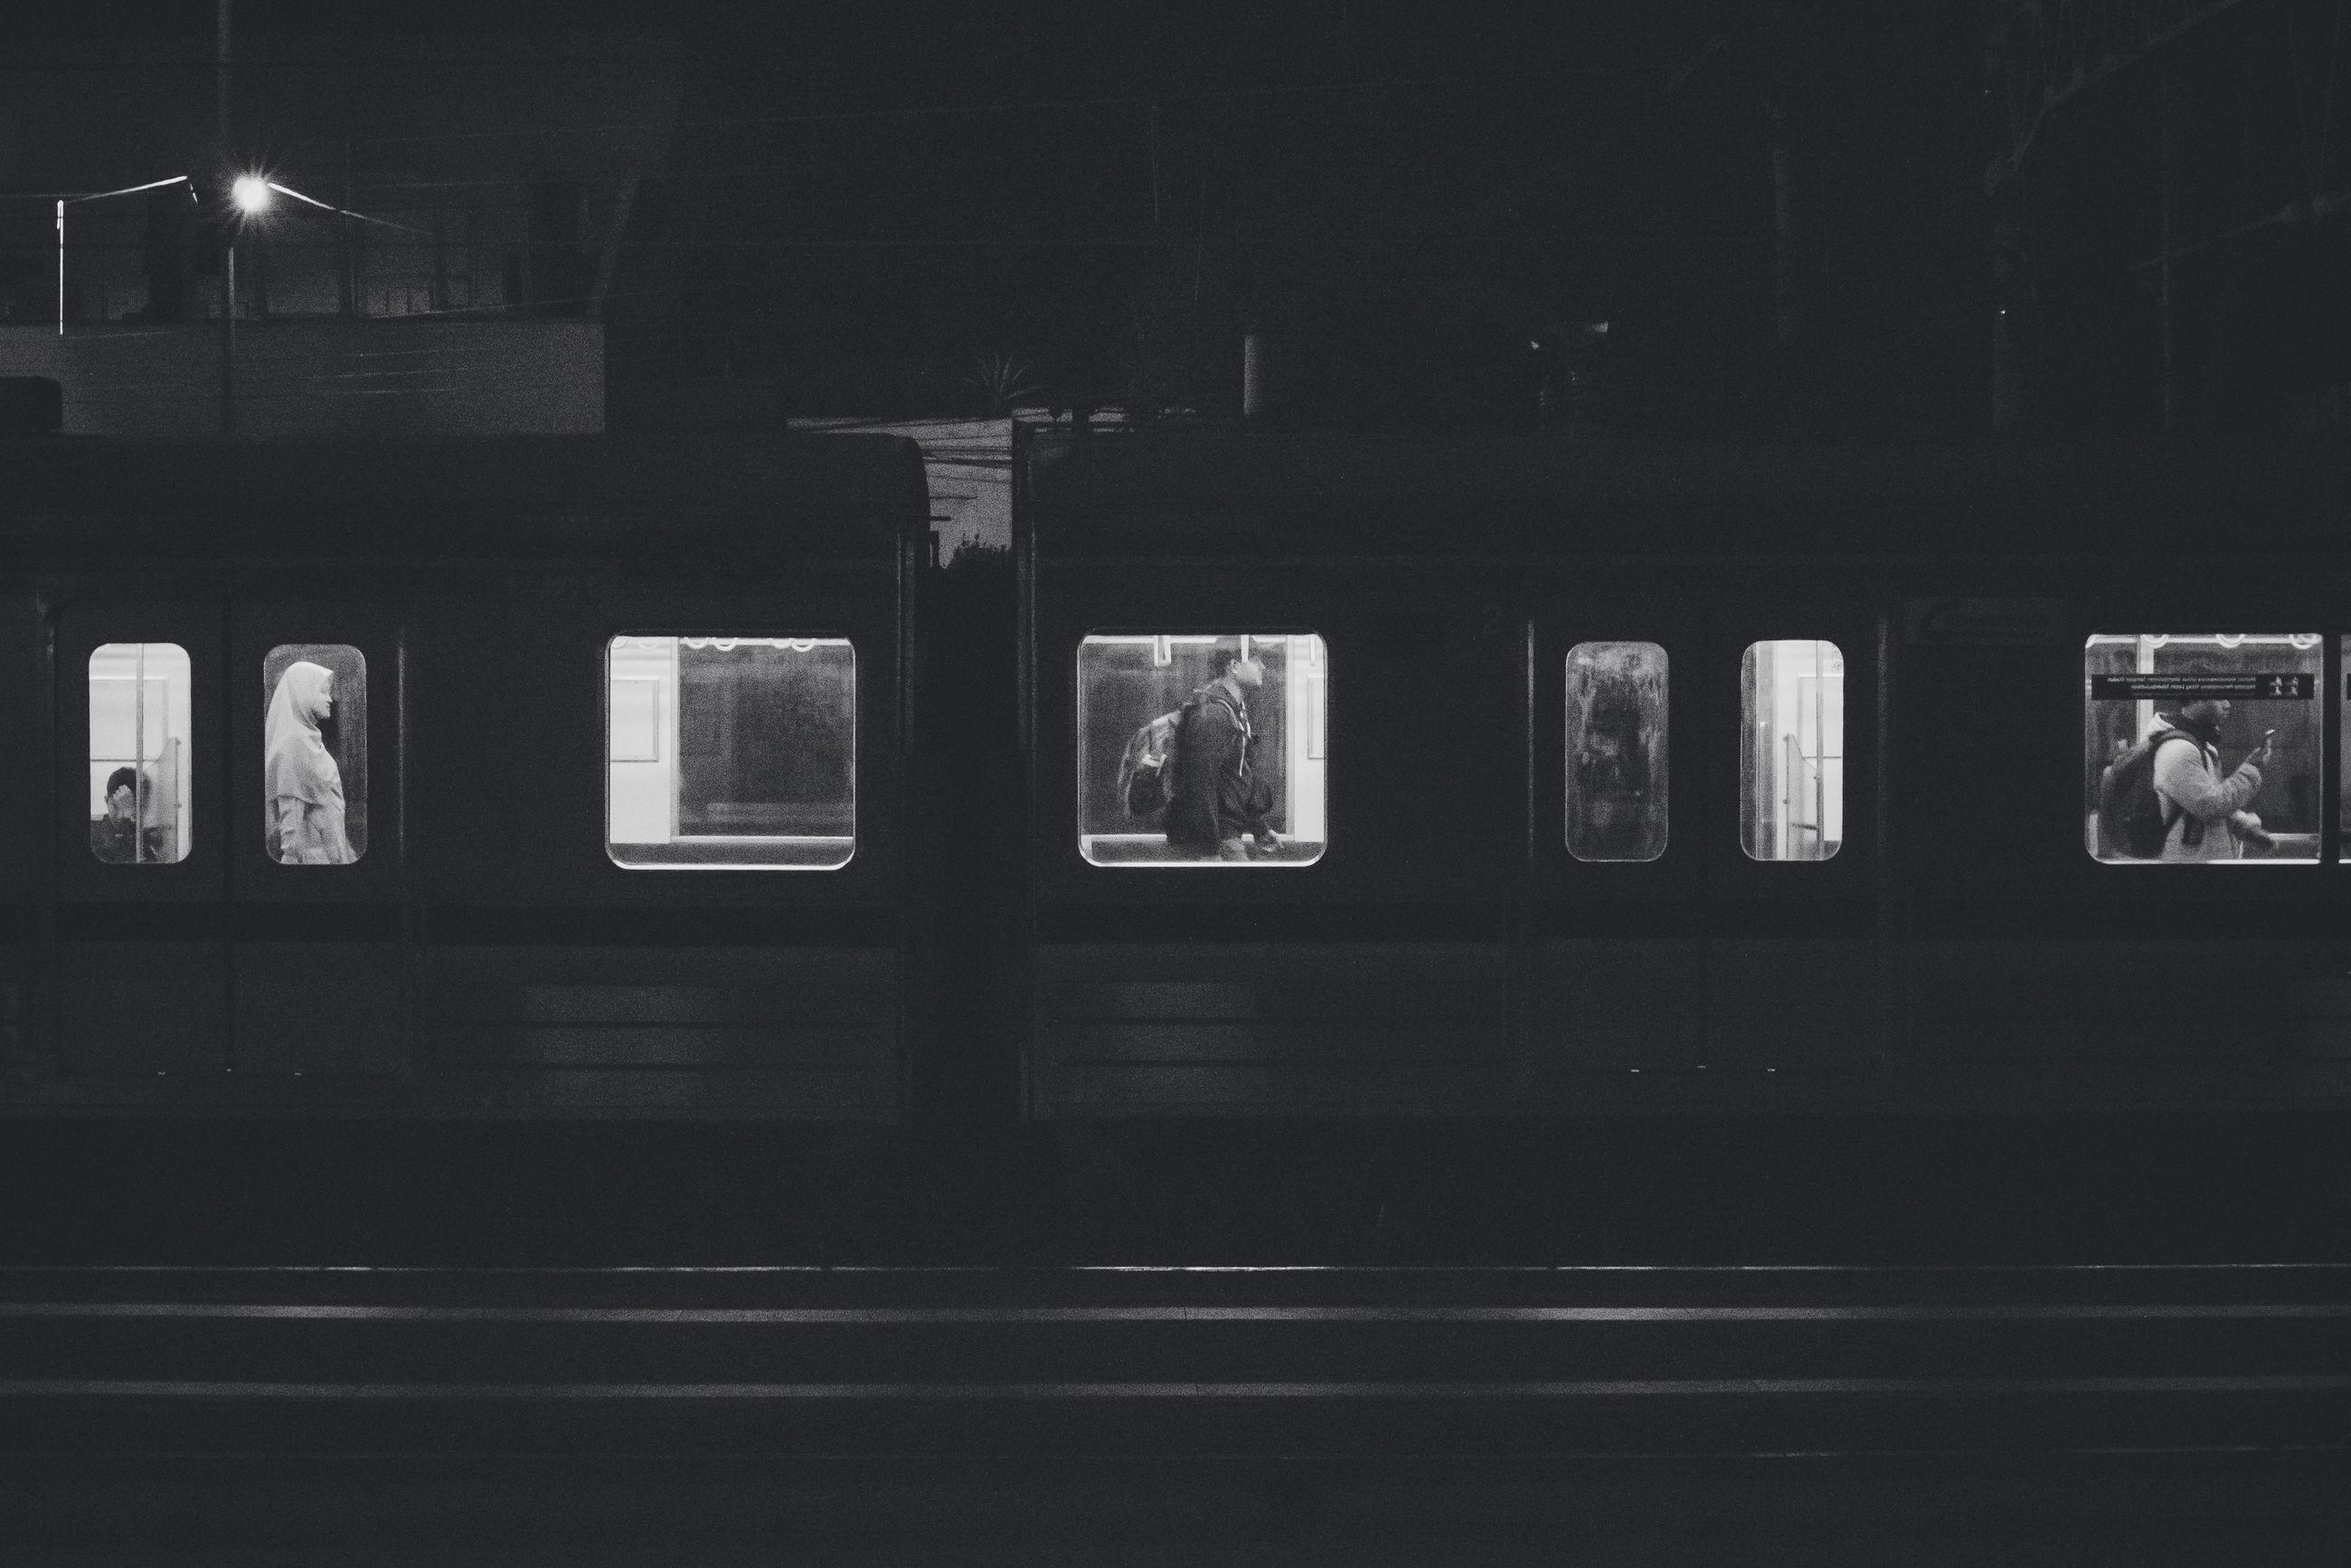 public transportation, rail transportation, train, mode of transportation, transportation, train - vehicle, railroad station, railroad station platform, architecture, illuminated, subway train, no people, built structure, window, travel, night, building exterior, station